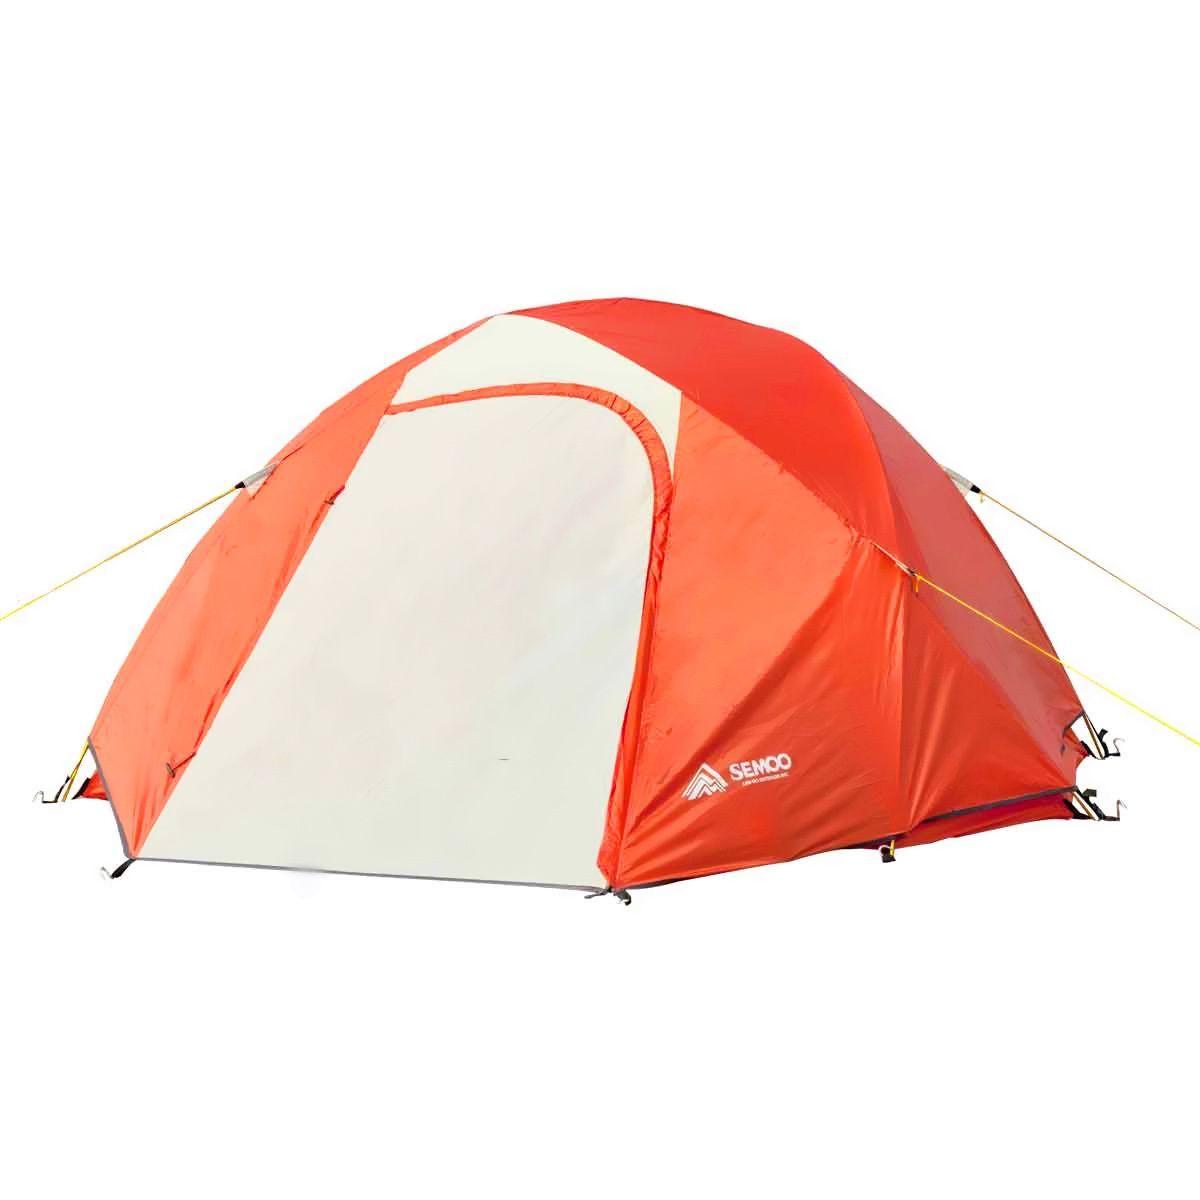 Semoo Tent Lightweight 3 Season Camping